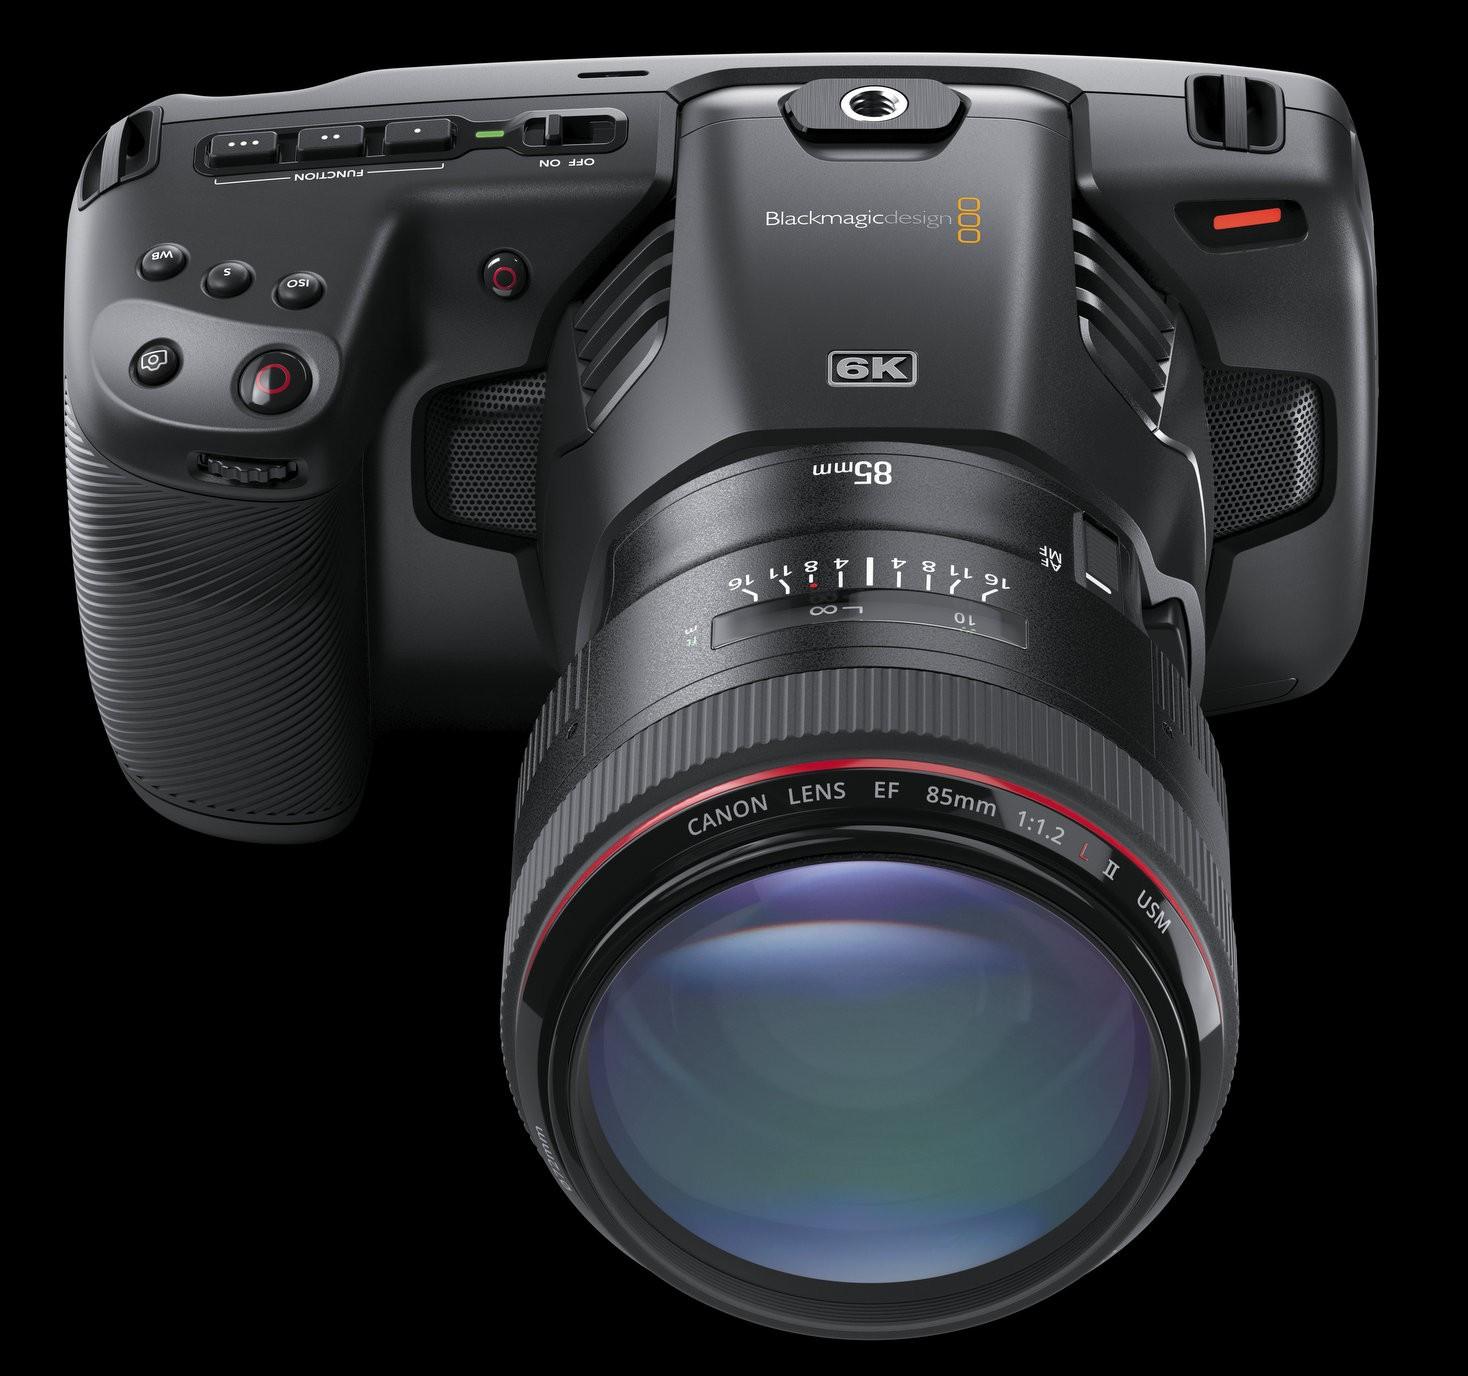 Blackmagic Design Announces New Blackmagic Pocket Cinema Camera 6k